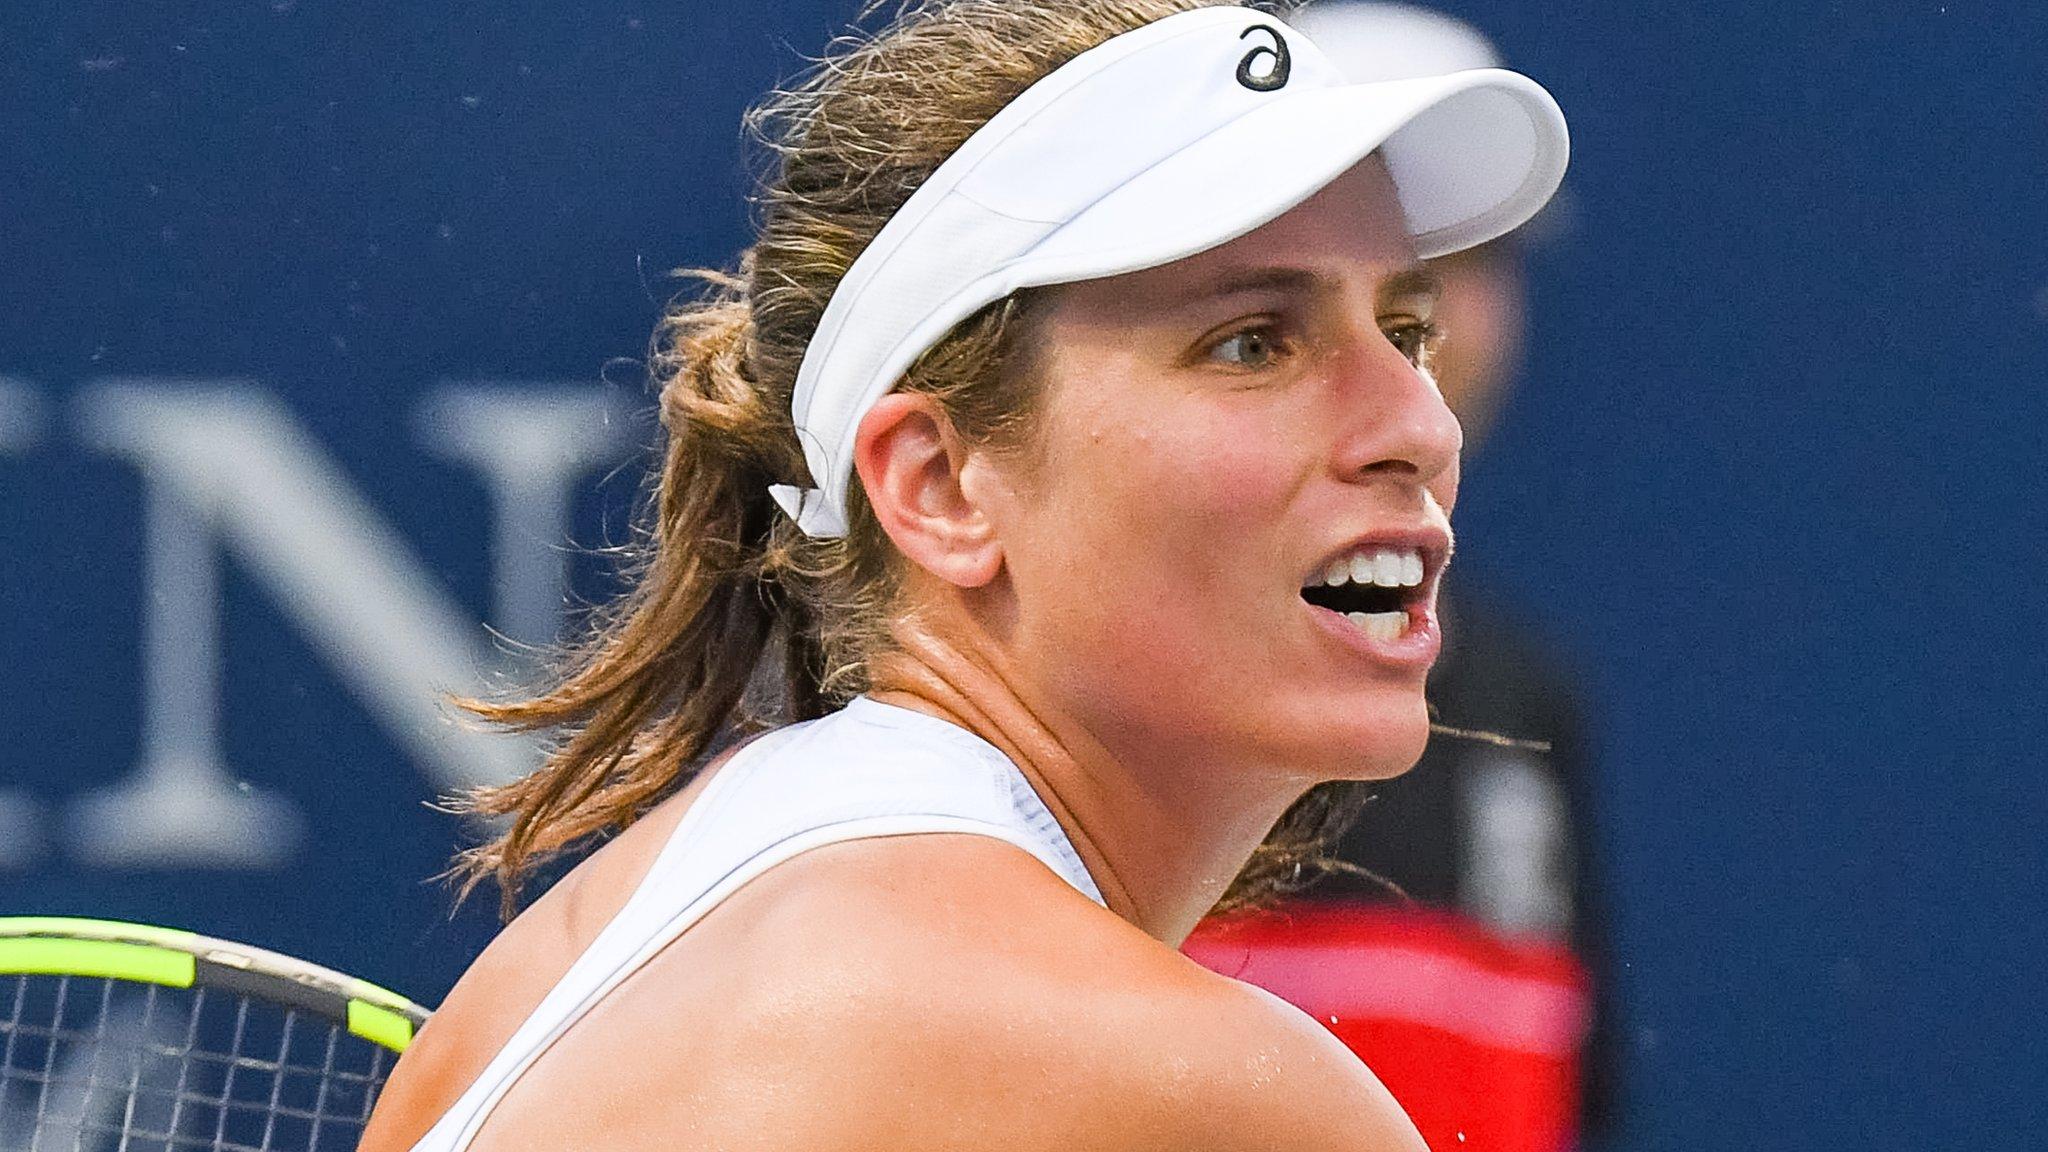 Rogers Cup: Johanna Konta beaten by Elina Svitolina in third round